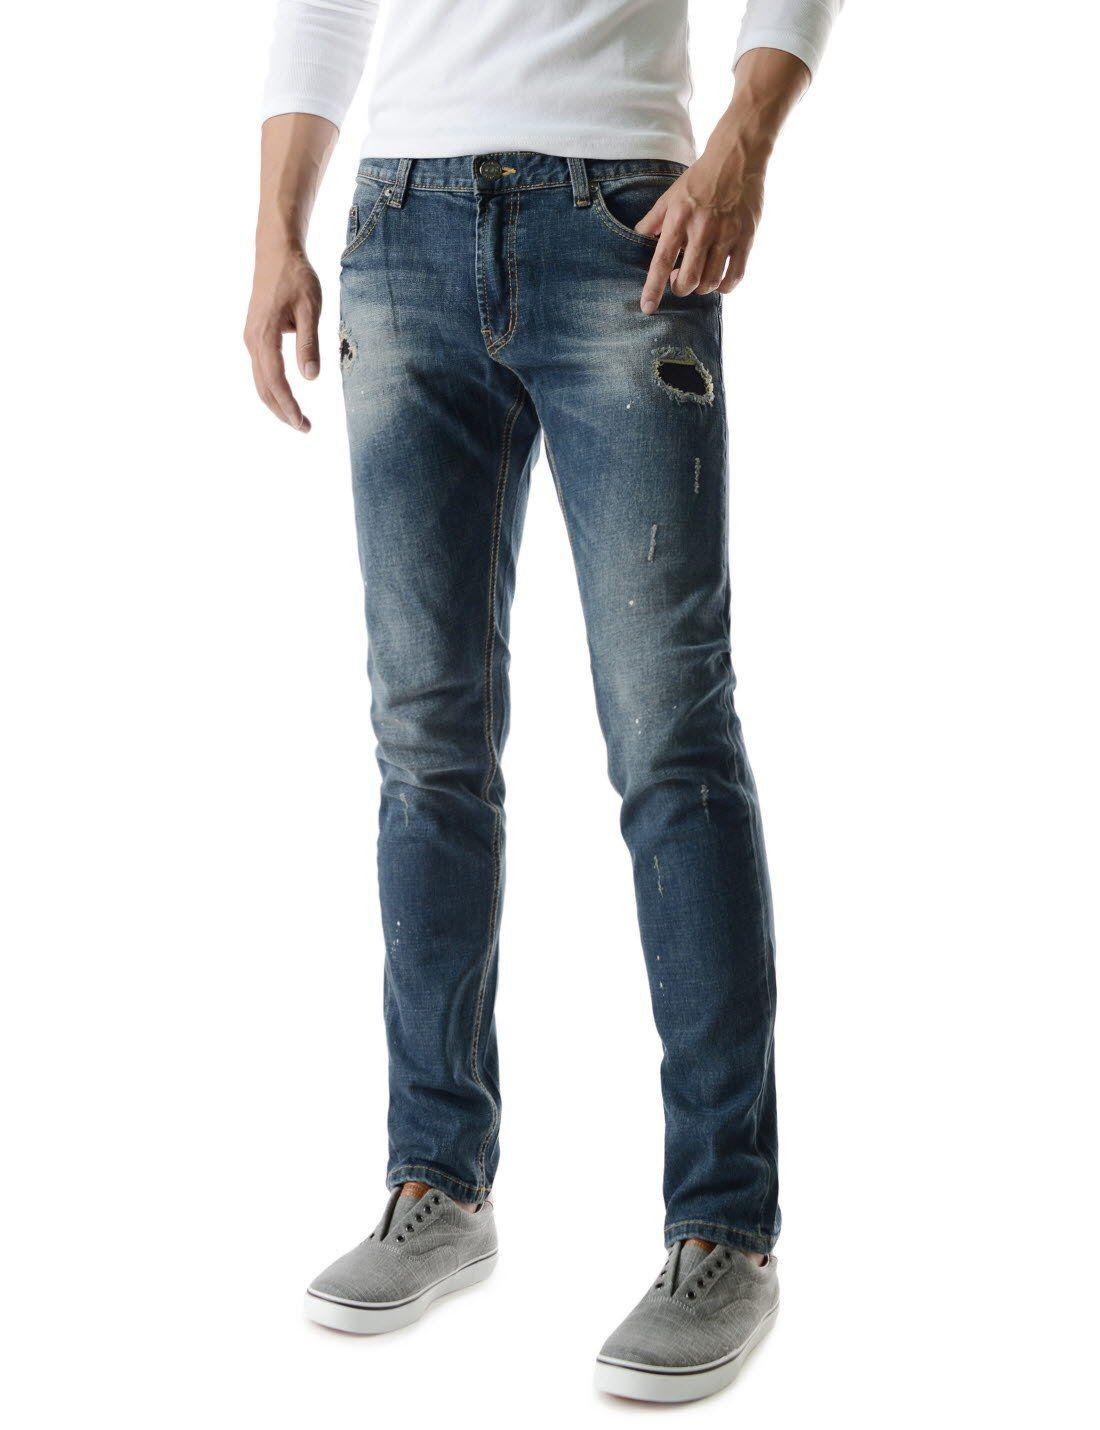 d01143cb08ef Sensual Mens Slim Fit Denim Pants Stylish Washing Unique Damage Jeans at  Amazon Men s Clothing store